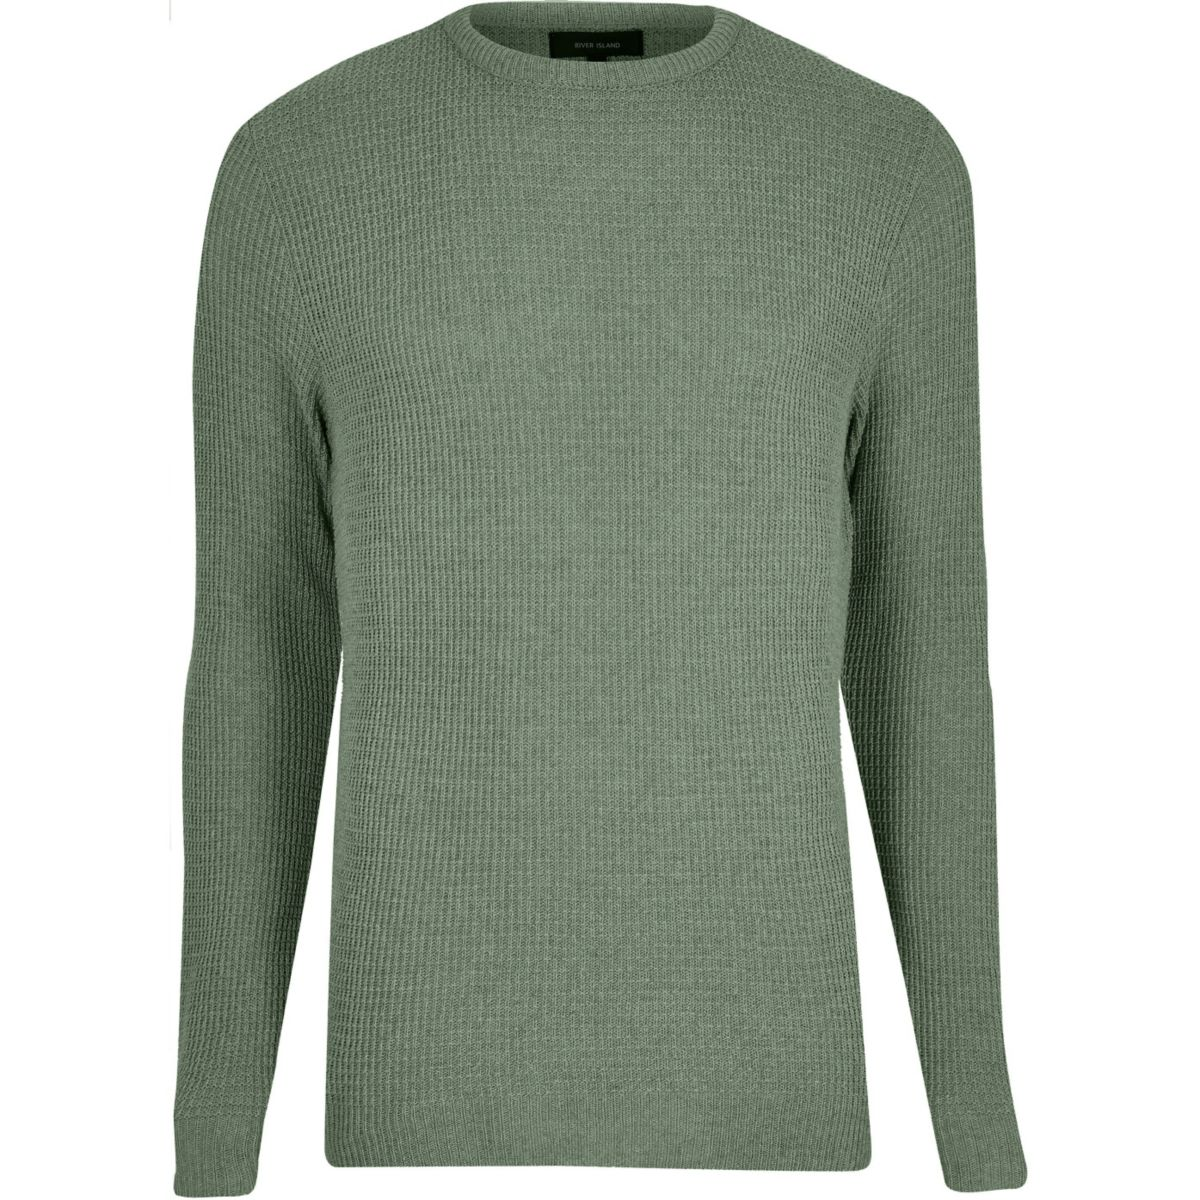 Light green textured knit jumper